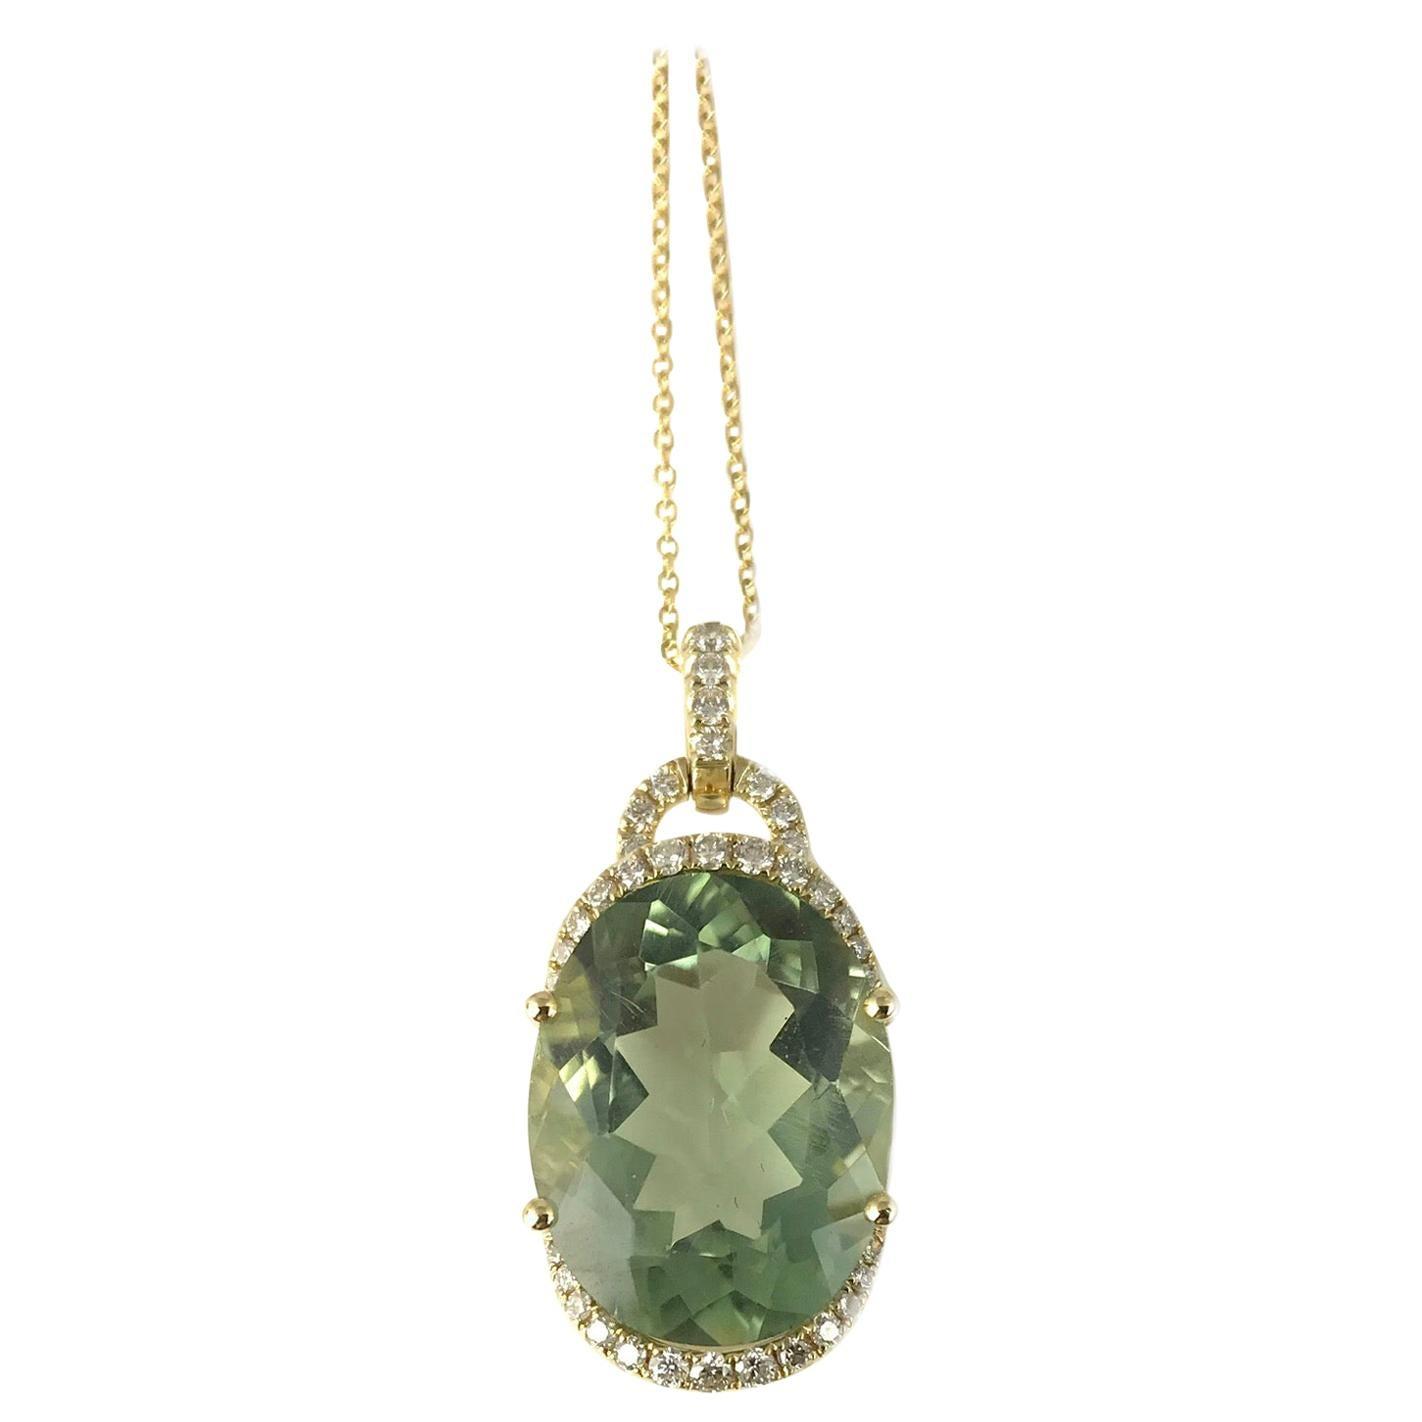 DiamondTown 10.63 Carat Oval Cut Exotic Green Amethyst and Diamond Pendant